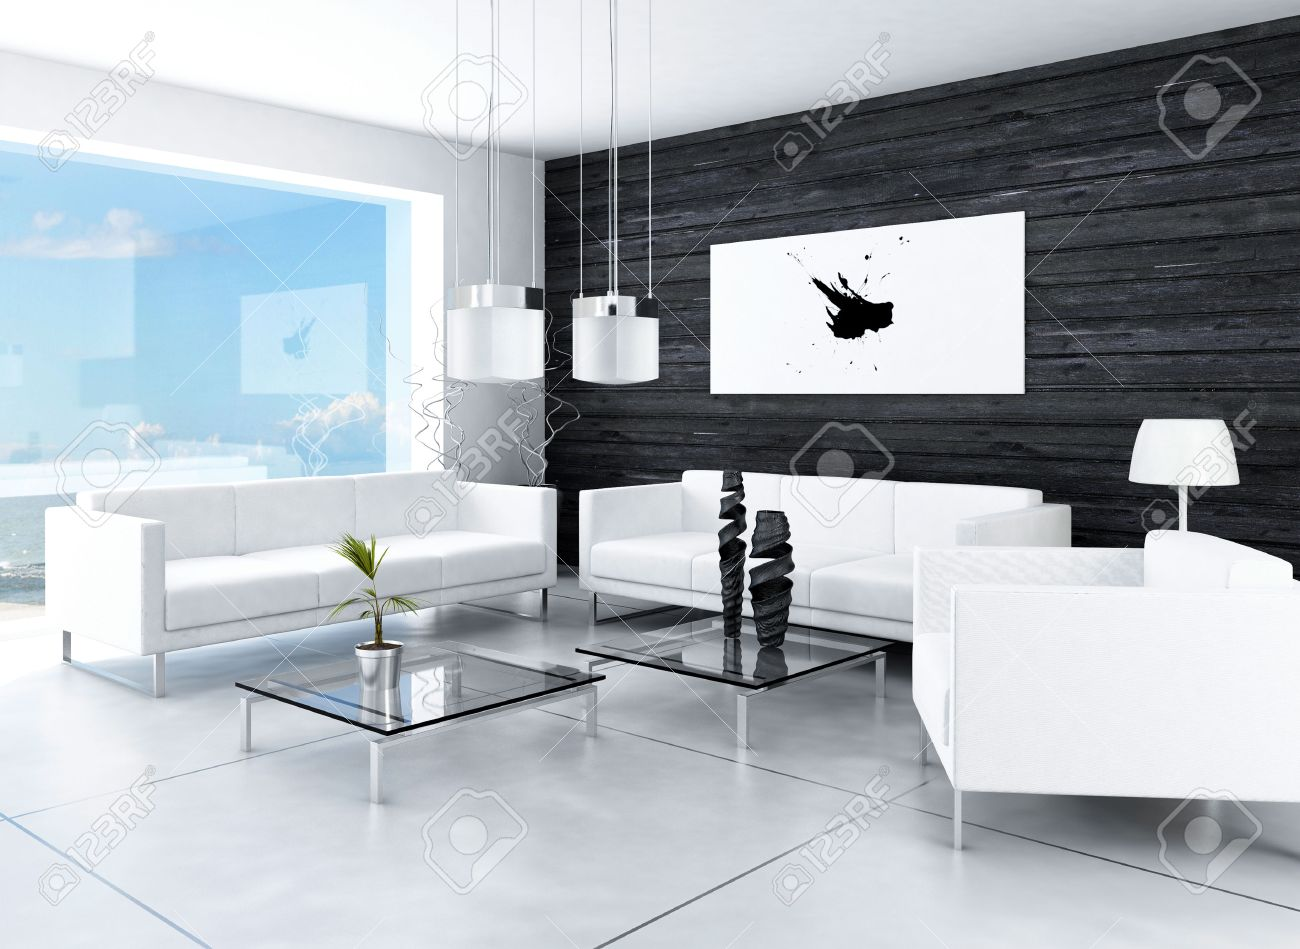 Stunning Le Fauteye Moderne Marconeen Images - Amazing House ...